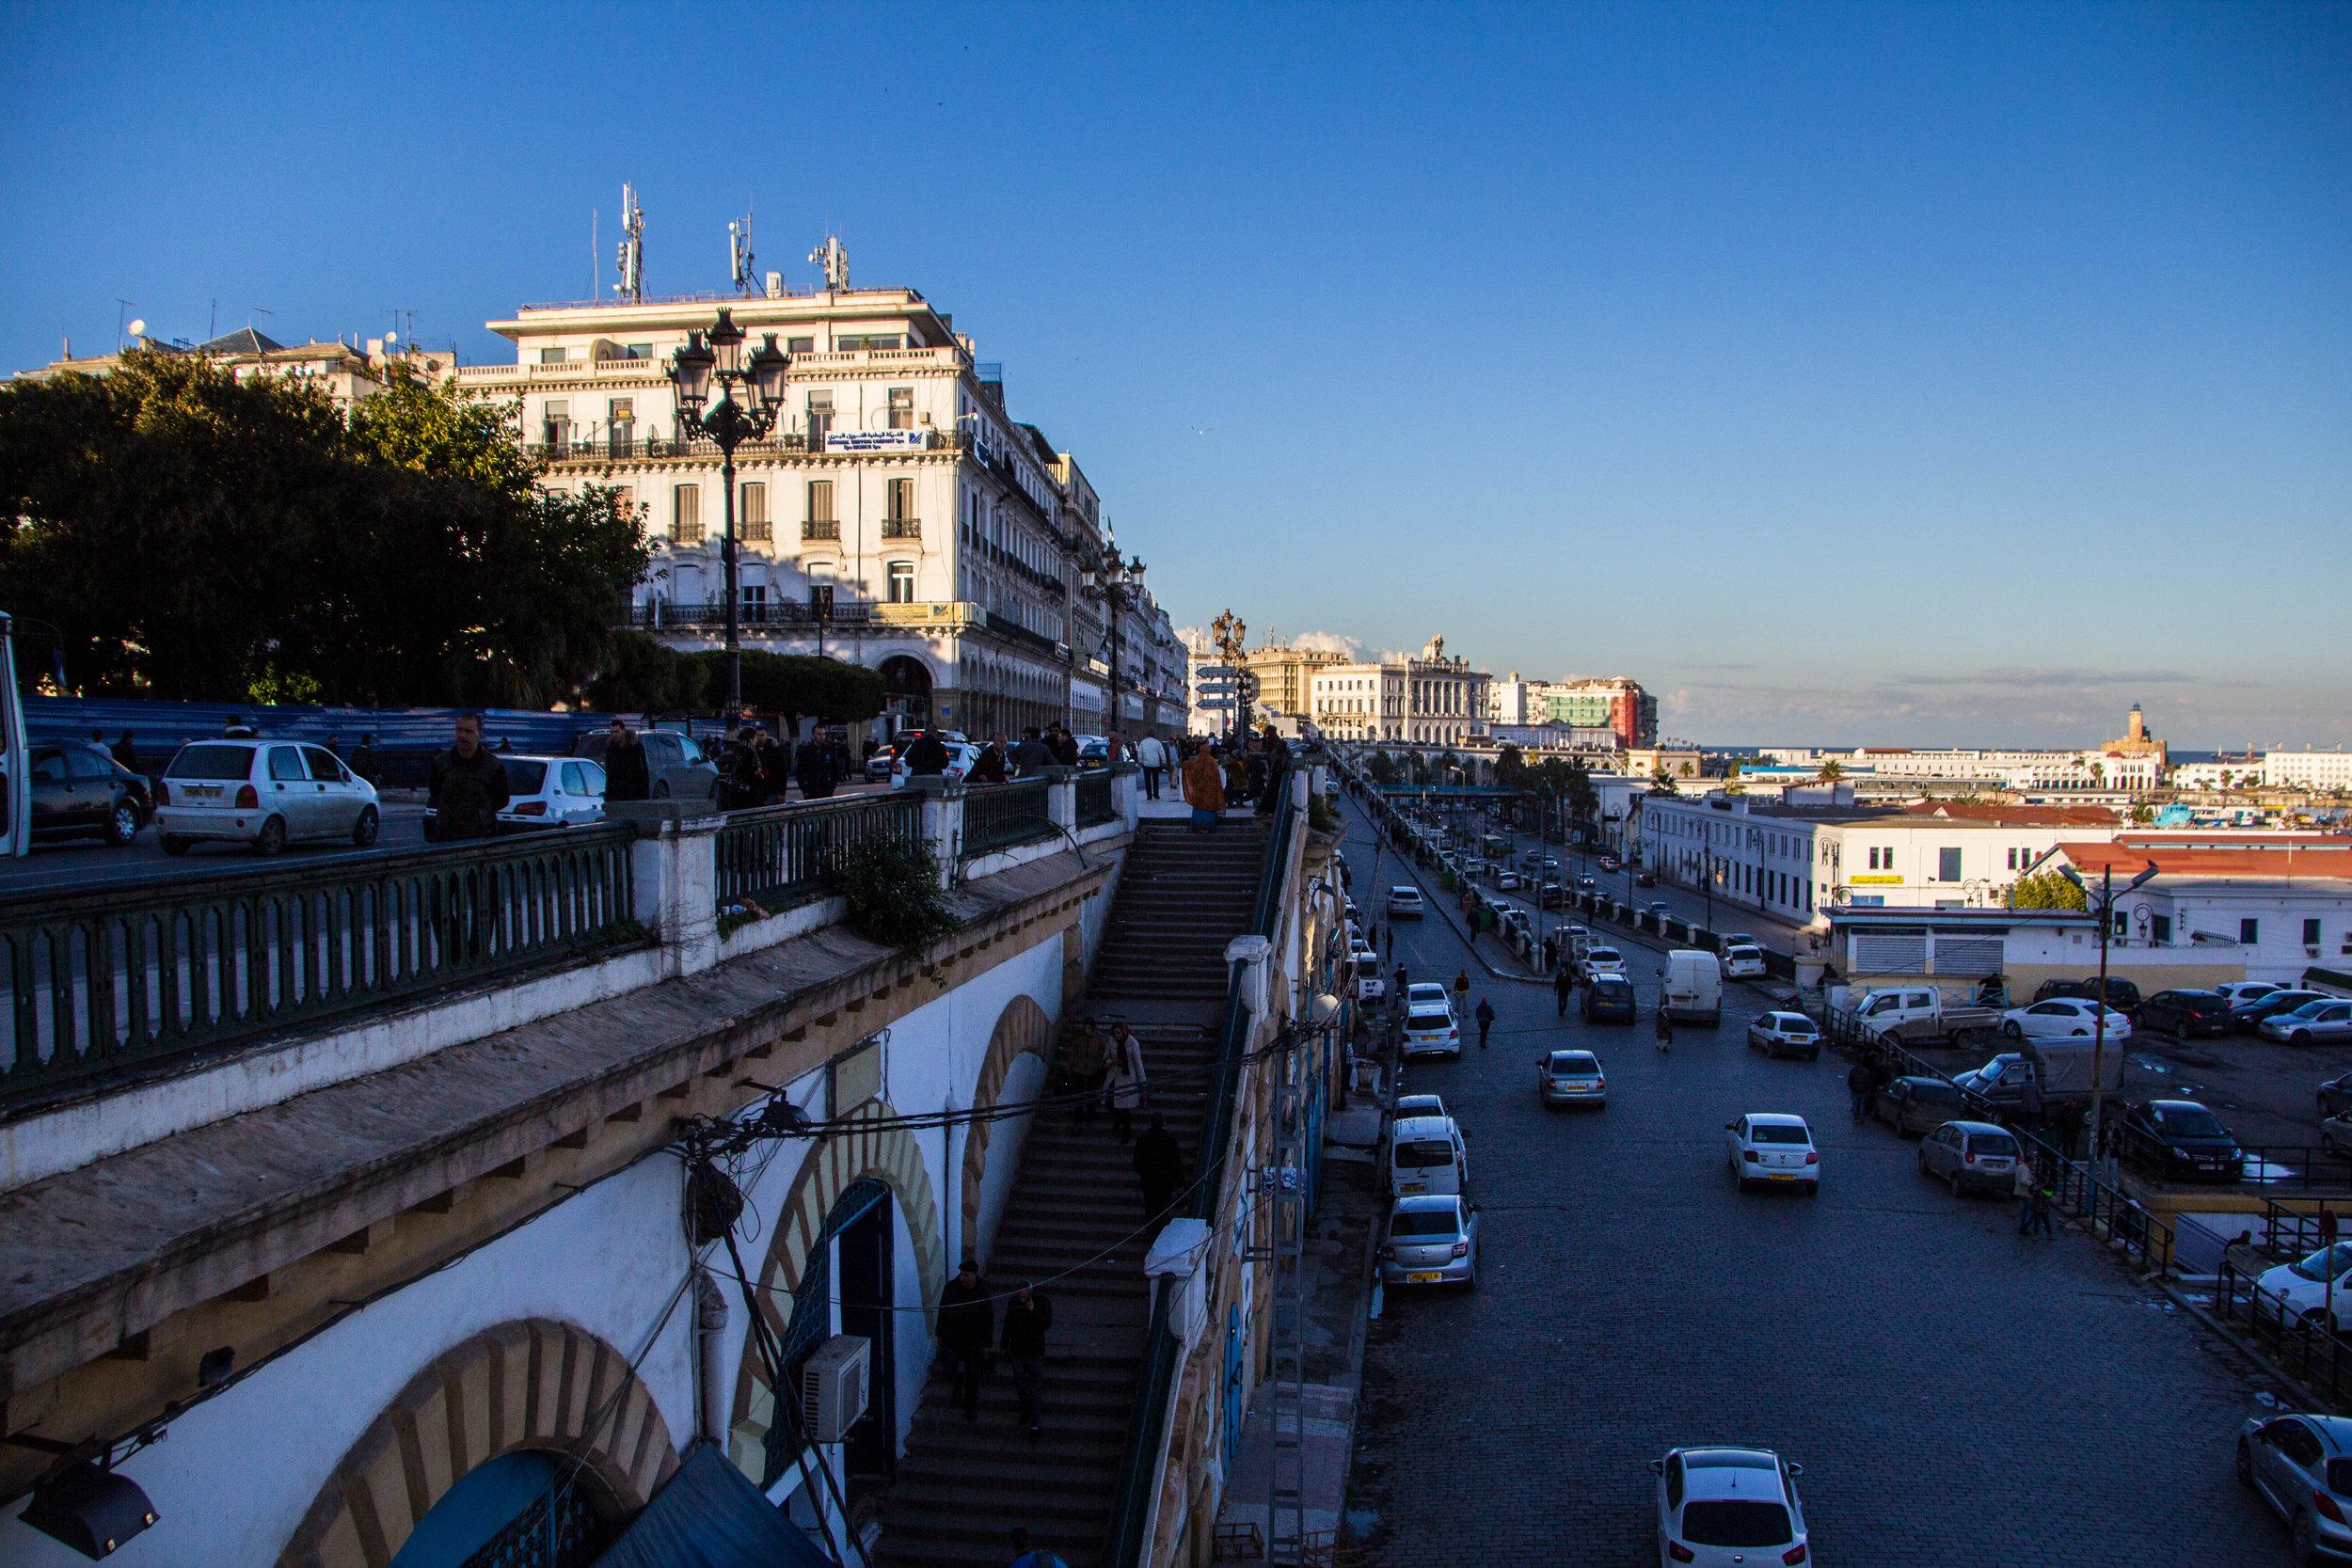 streets-algiers-algeria-34.jpg